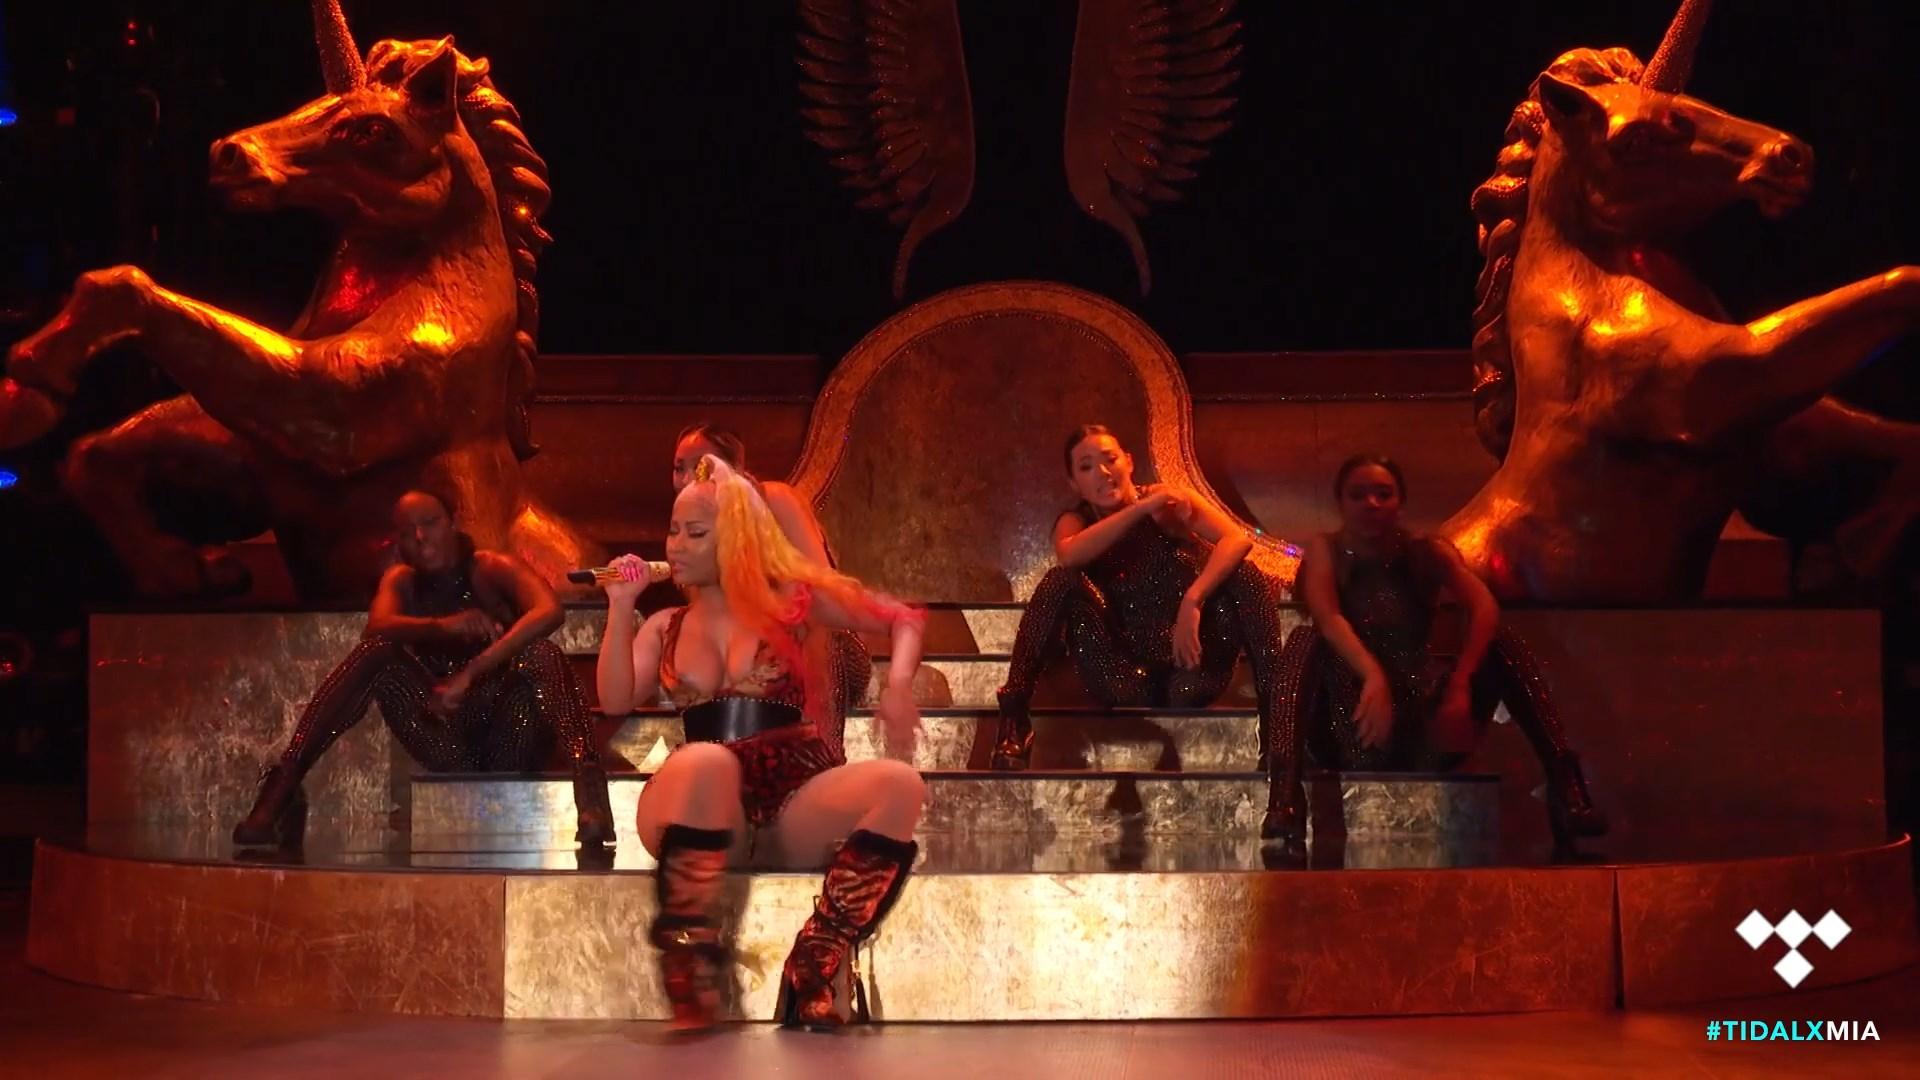 Nicki-Minaj-Nude-TheFappeningBlog.com-28.jpg